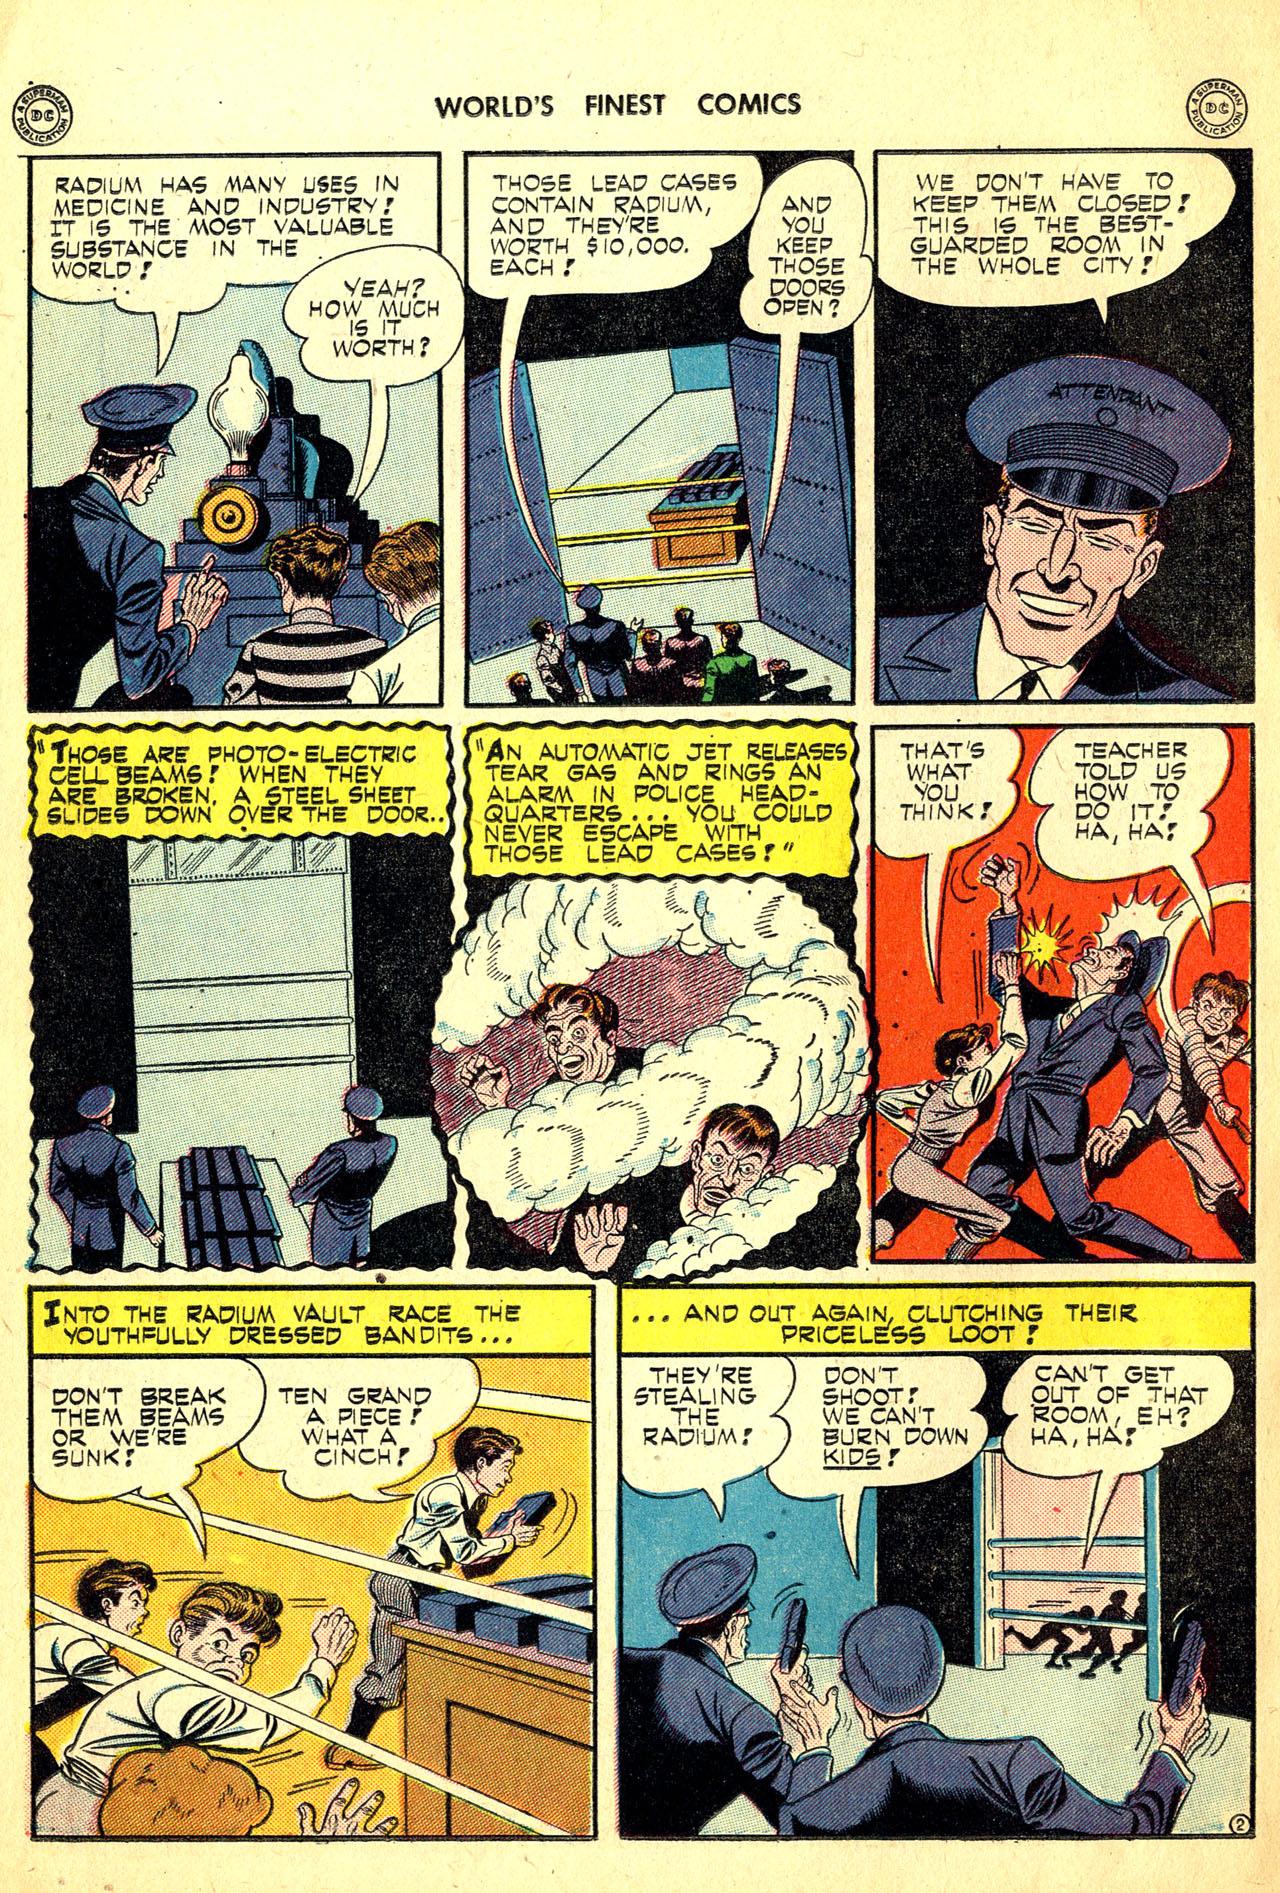 Read online World's Finest Comics comic -  Issue #18 - 70